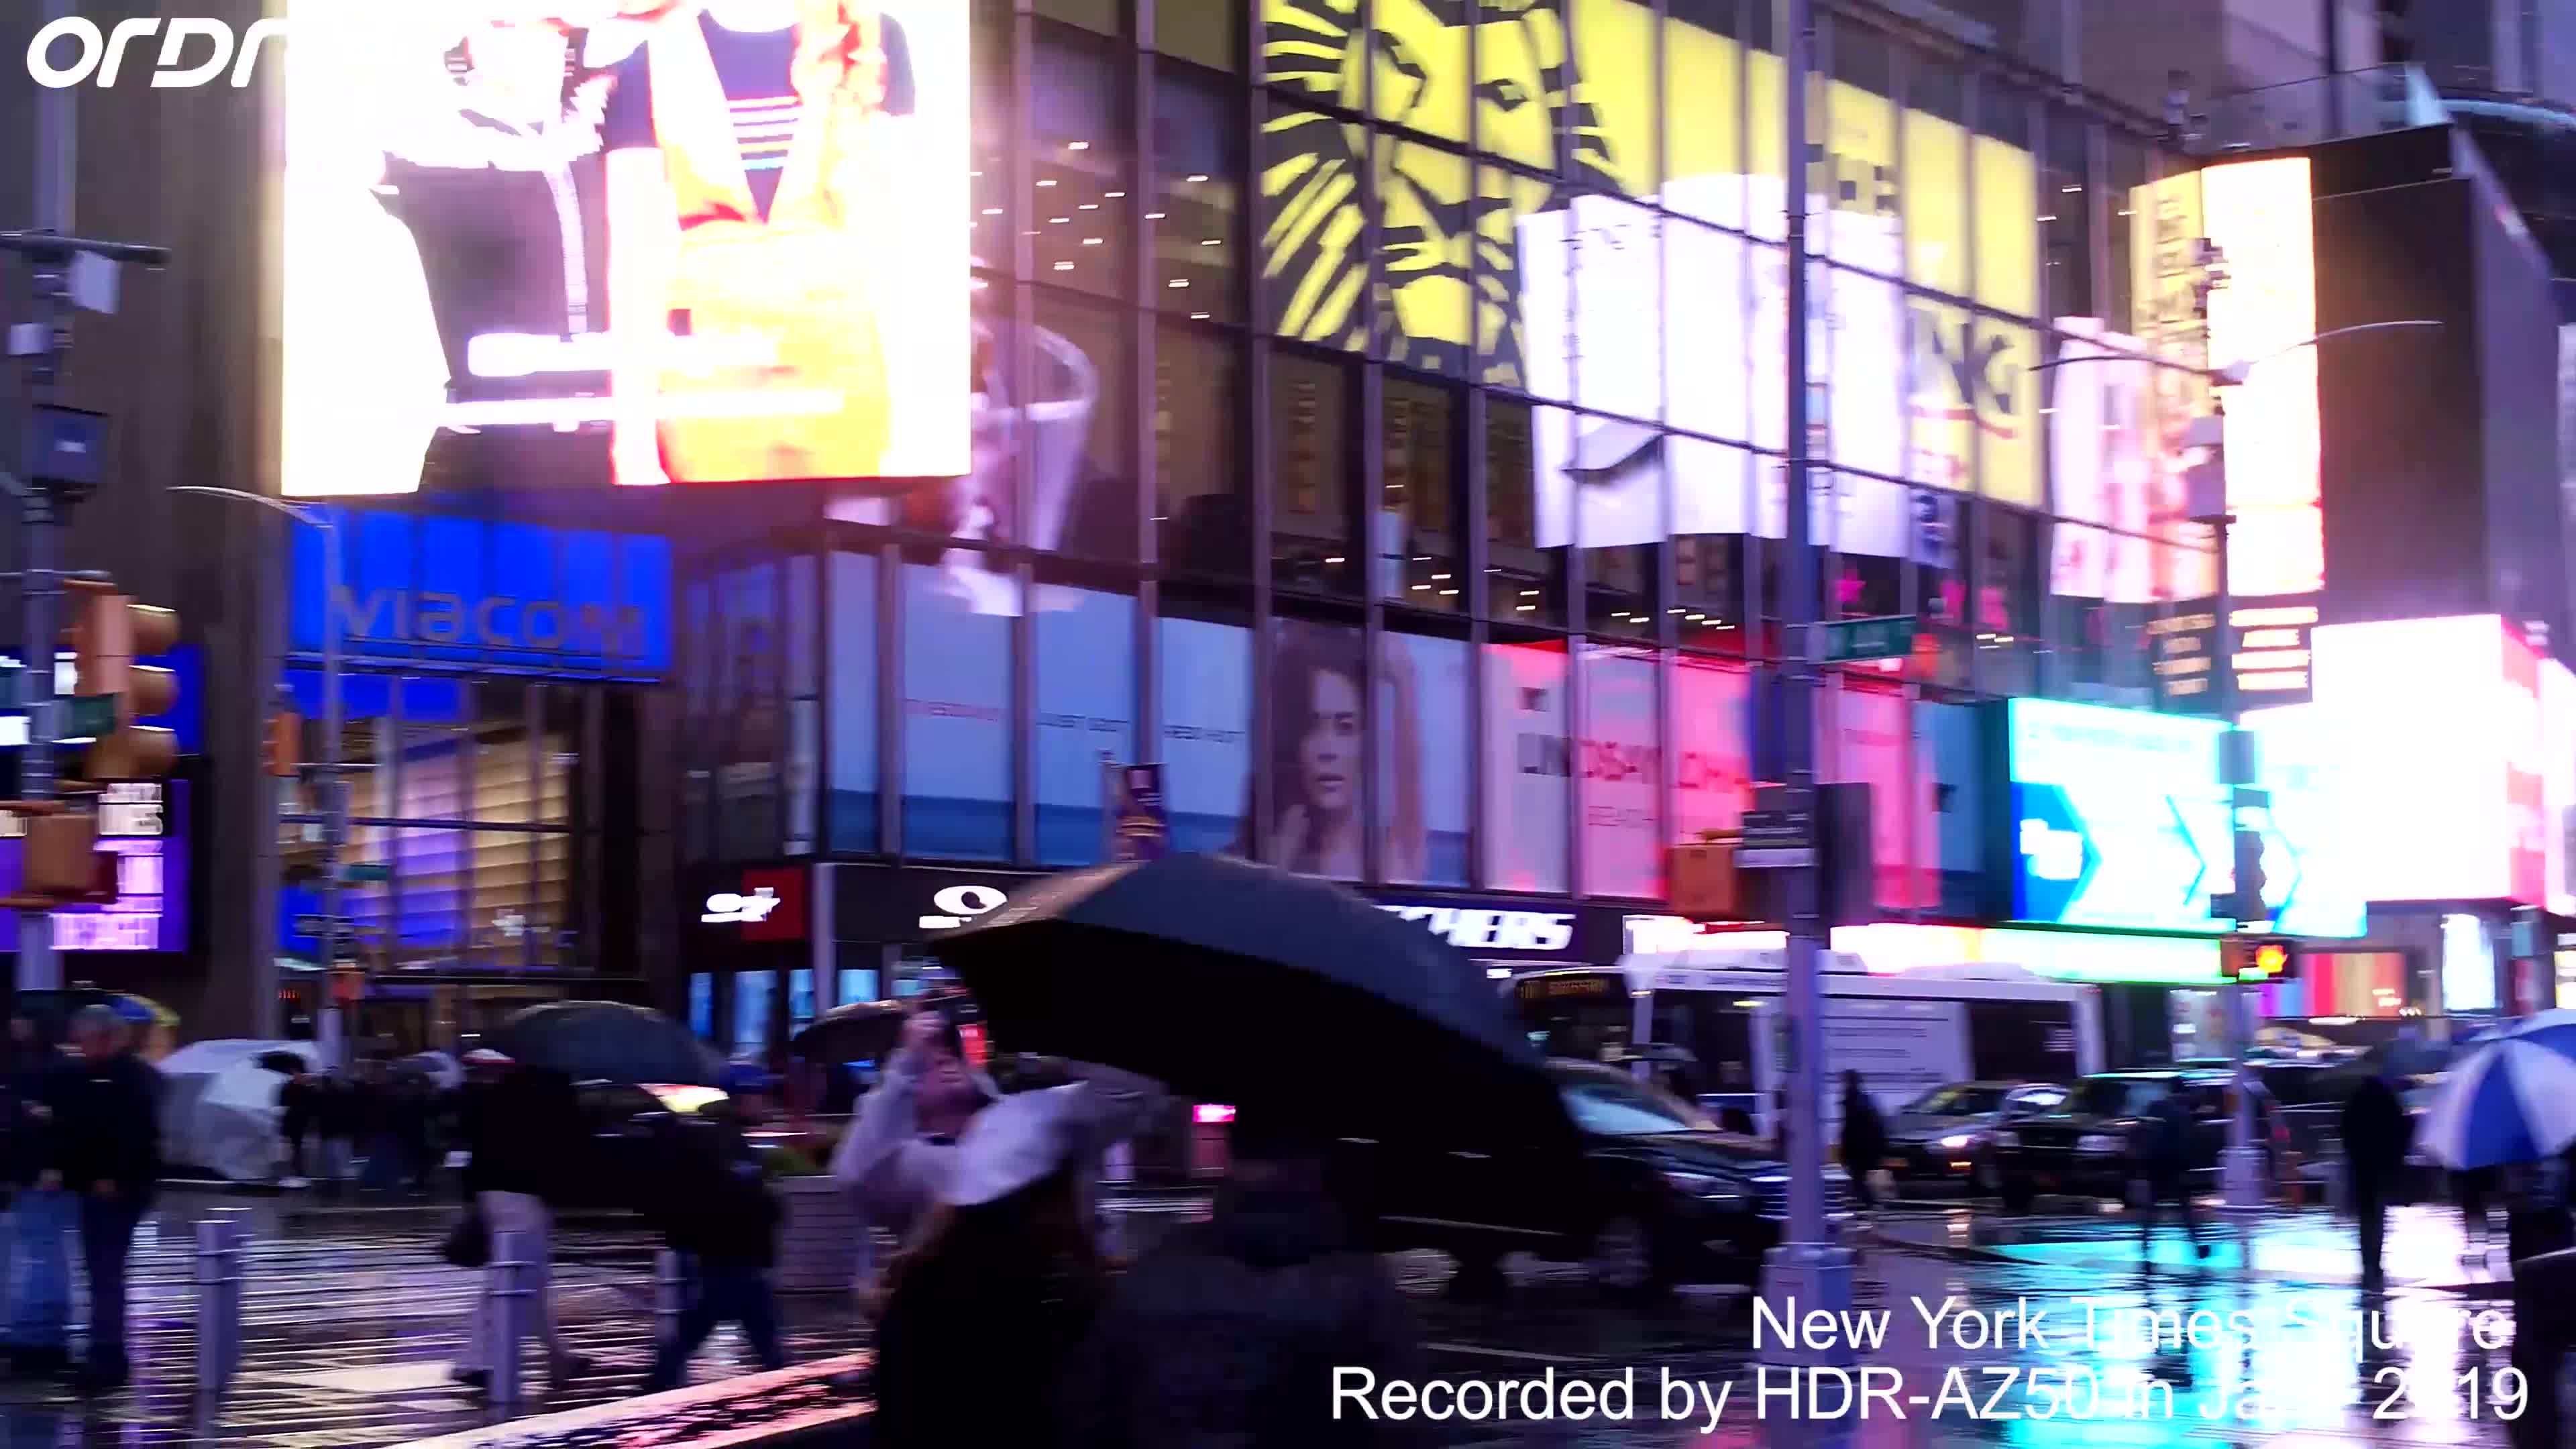 AZ50 卸売赤外線ナイトビジョン 4 2K ウルトラ HD Vlog 家族インタビュービデオカメラ